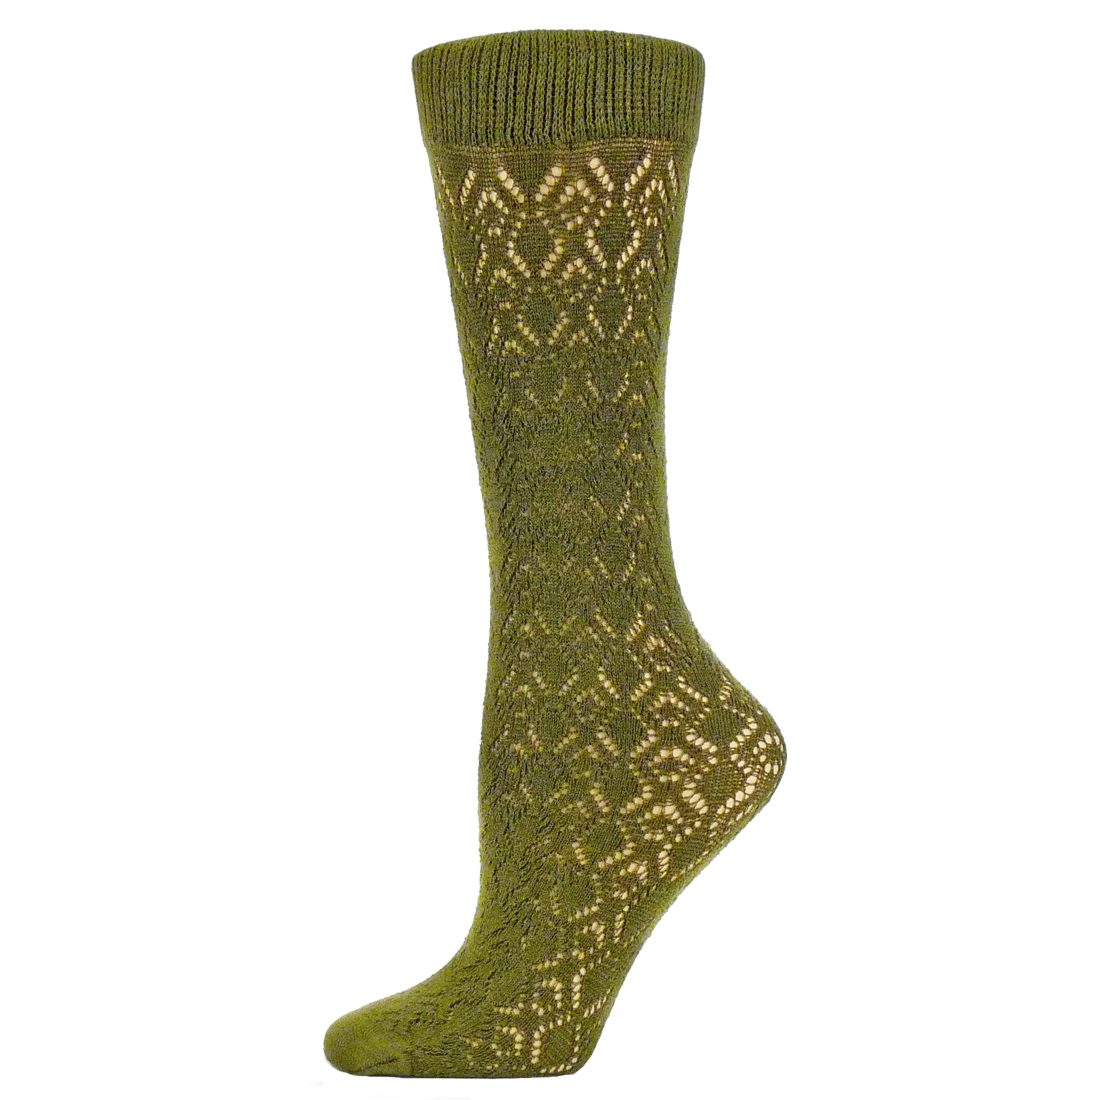 B.ella Doris Cotton Womens Crochet Trouser Sock (One Size - Crew) | EBay